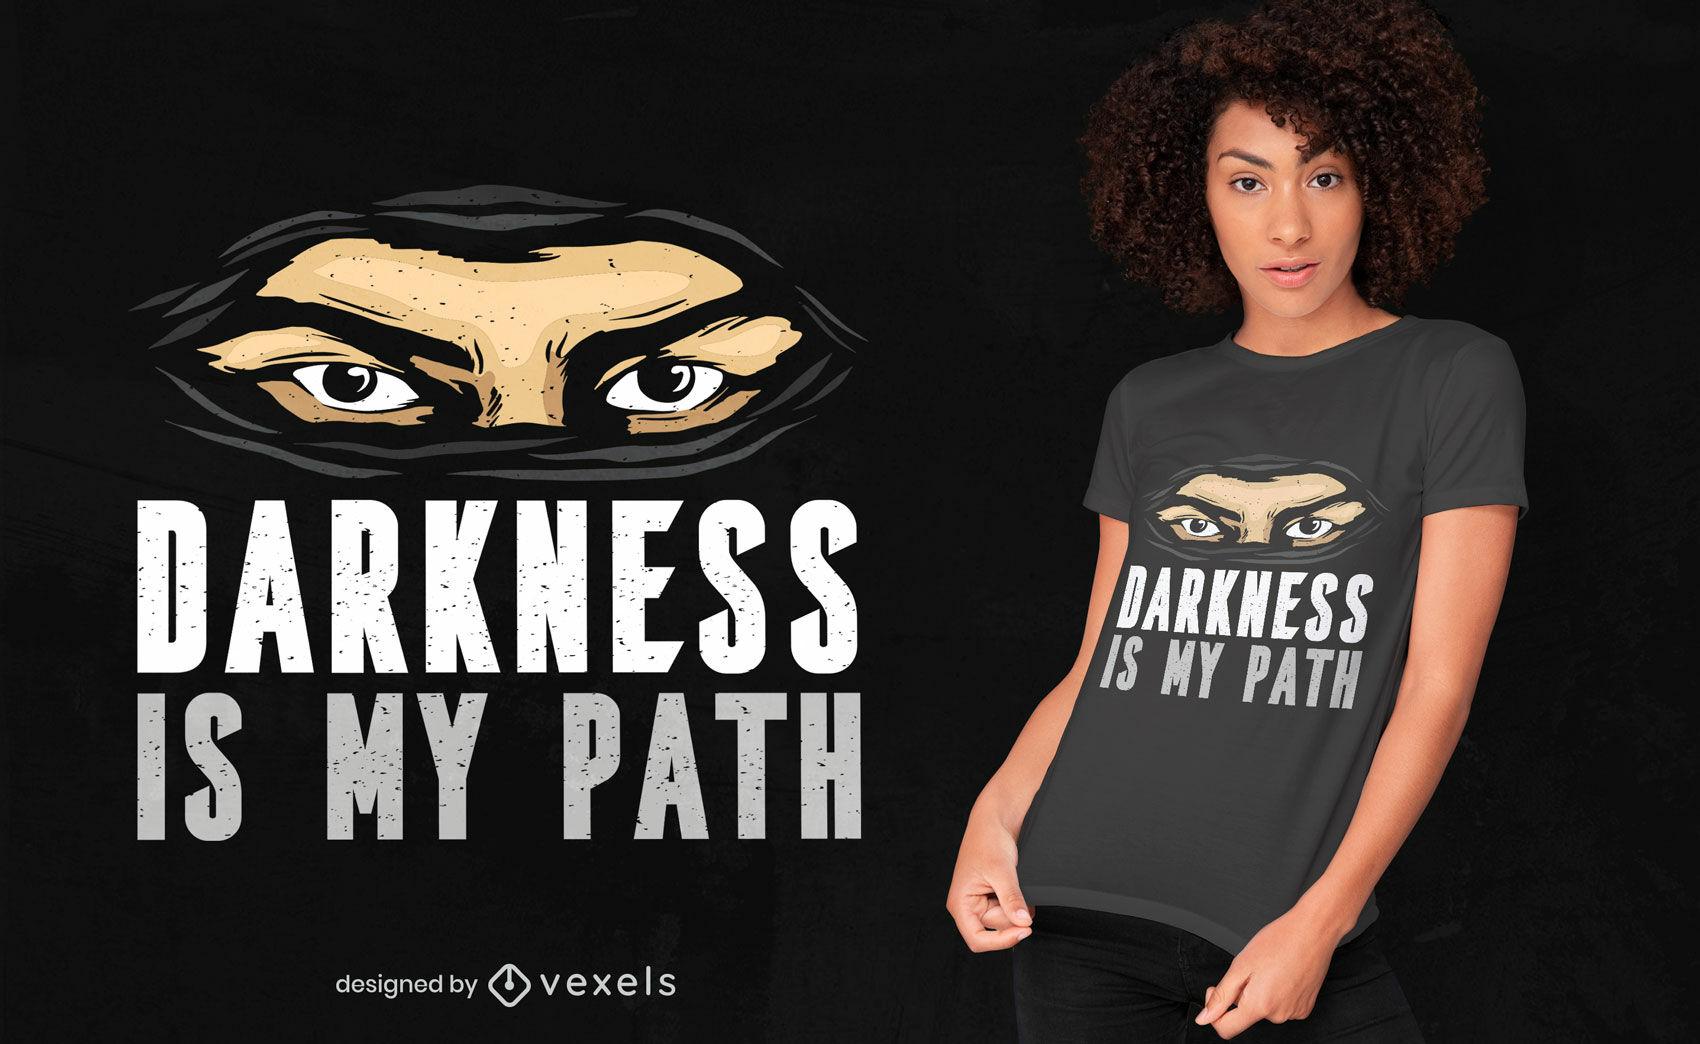 Ninja Maske Dunkelheit Zitat T-Shirt Design